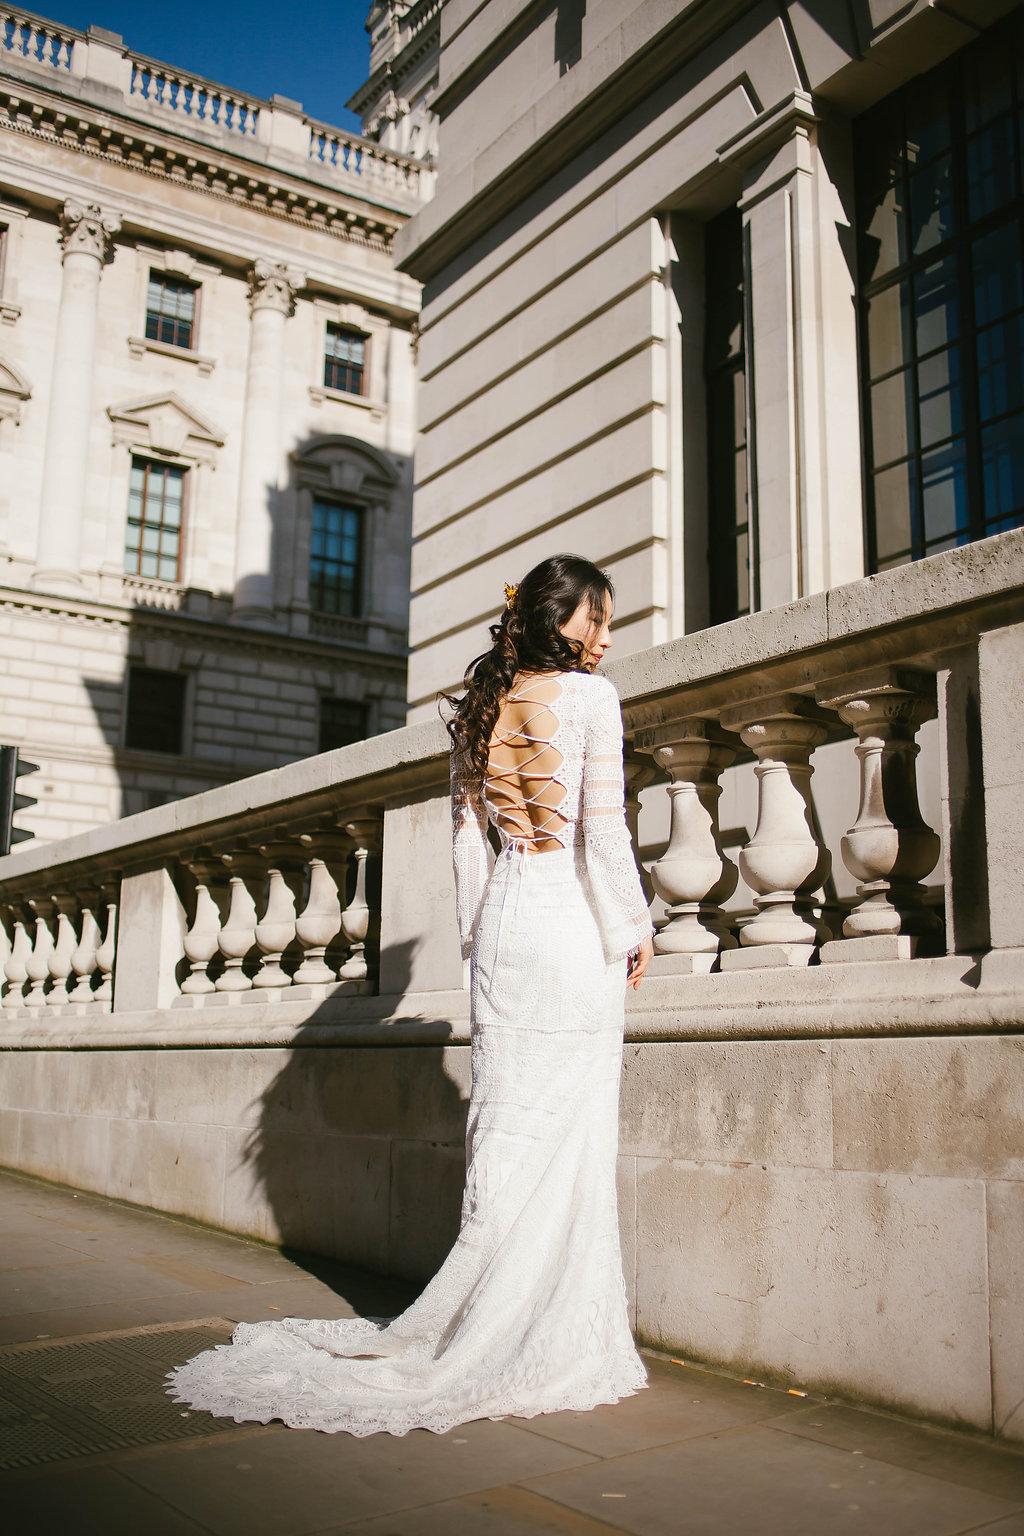 Nina Pang Photography - City Bride - London wedding - City wedding - Chinese wedding 2